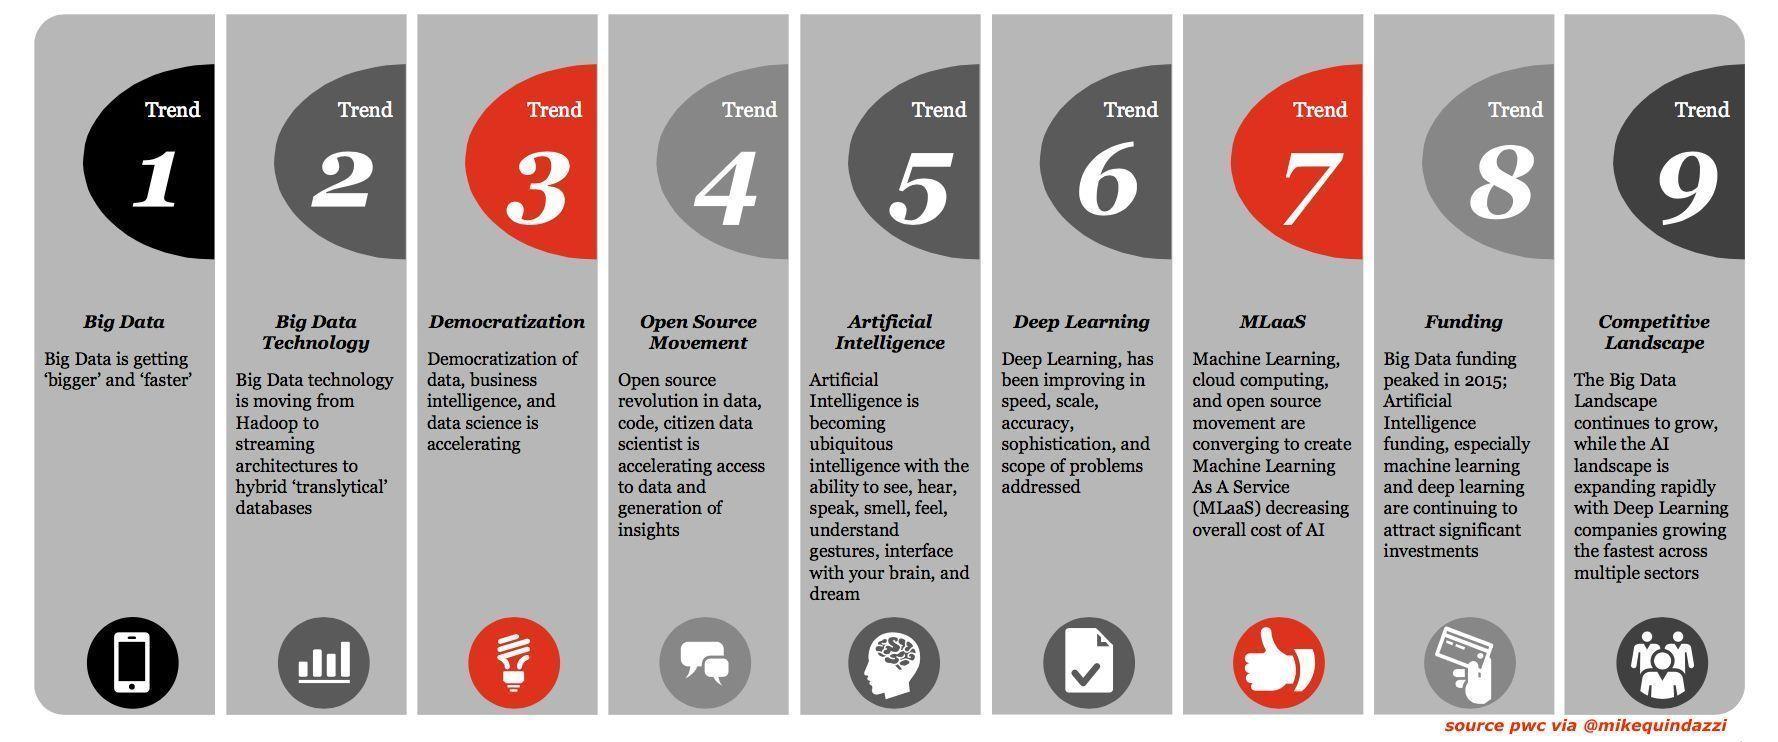 9 Bigdata Trends Infographics Pwc Via Mikequindazzi Ai Artificialintelligence Iot Mlaa Deep Learning Big Data Technologies Machine Learning